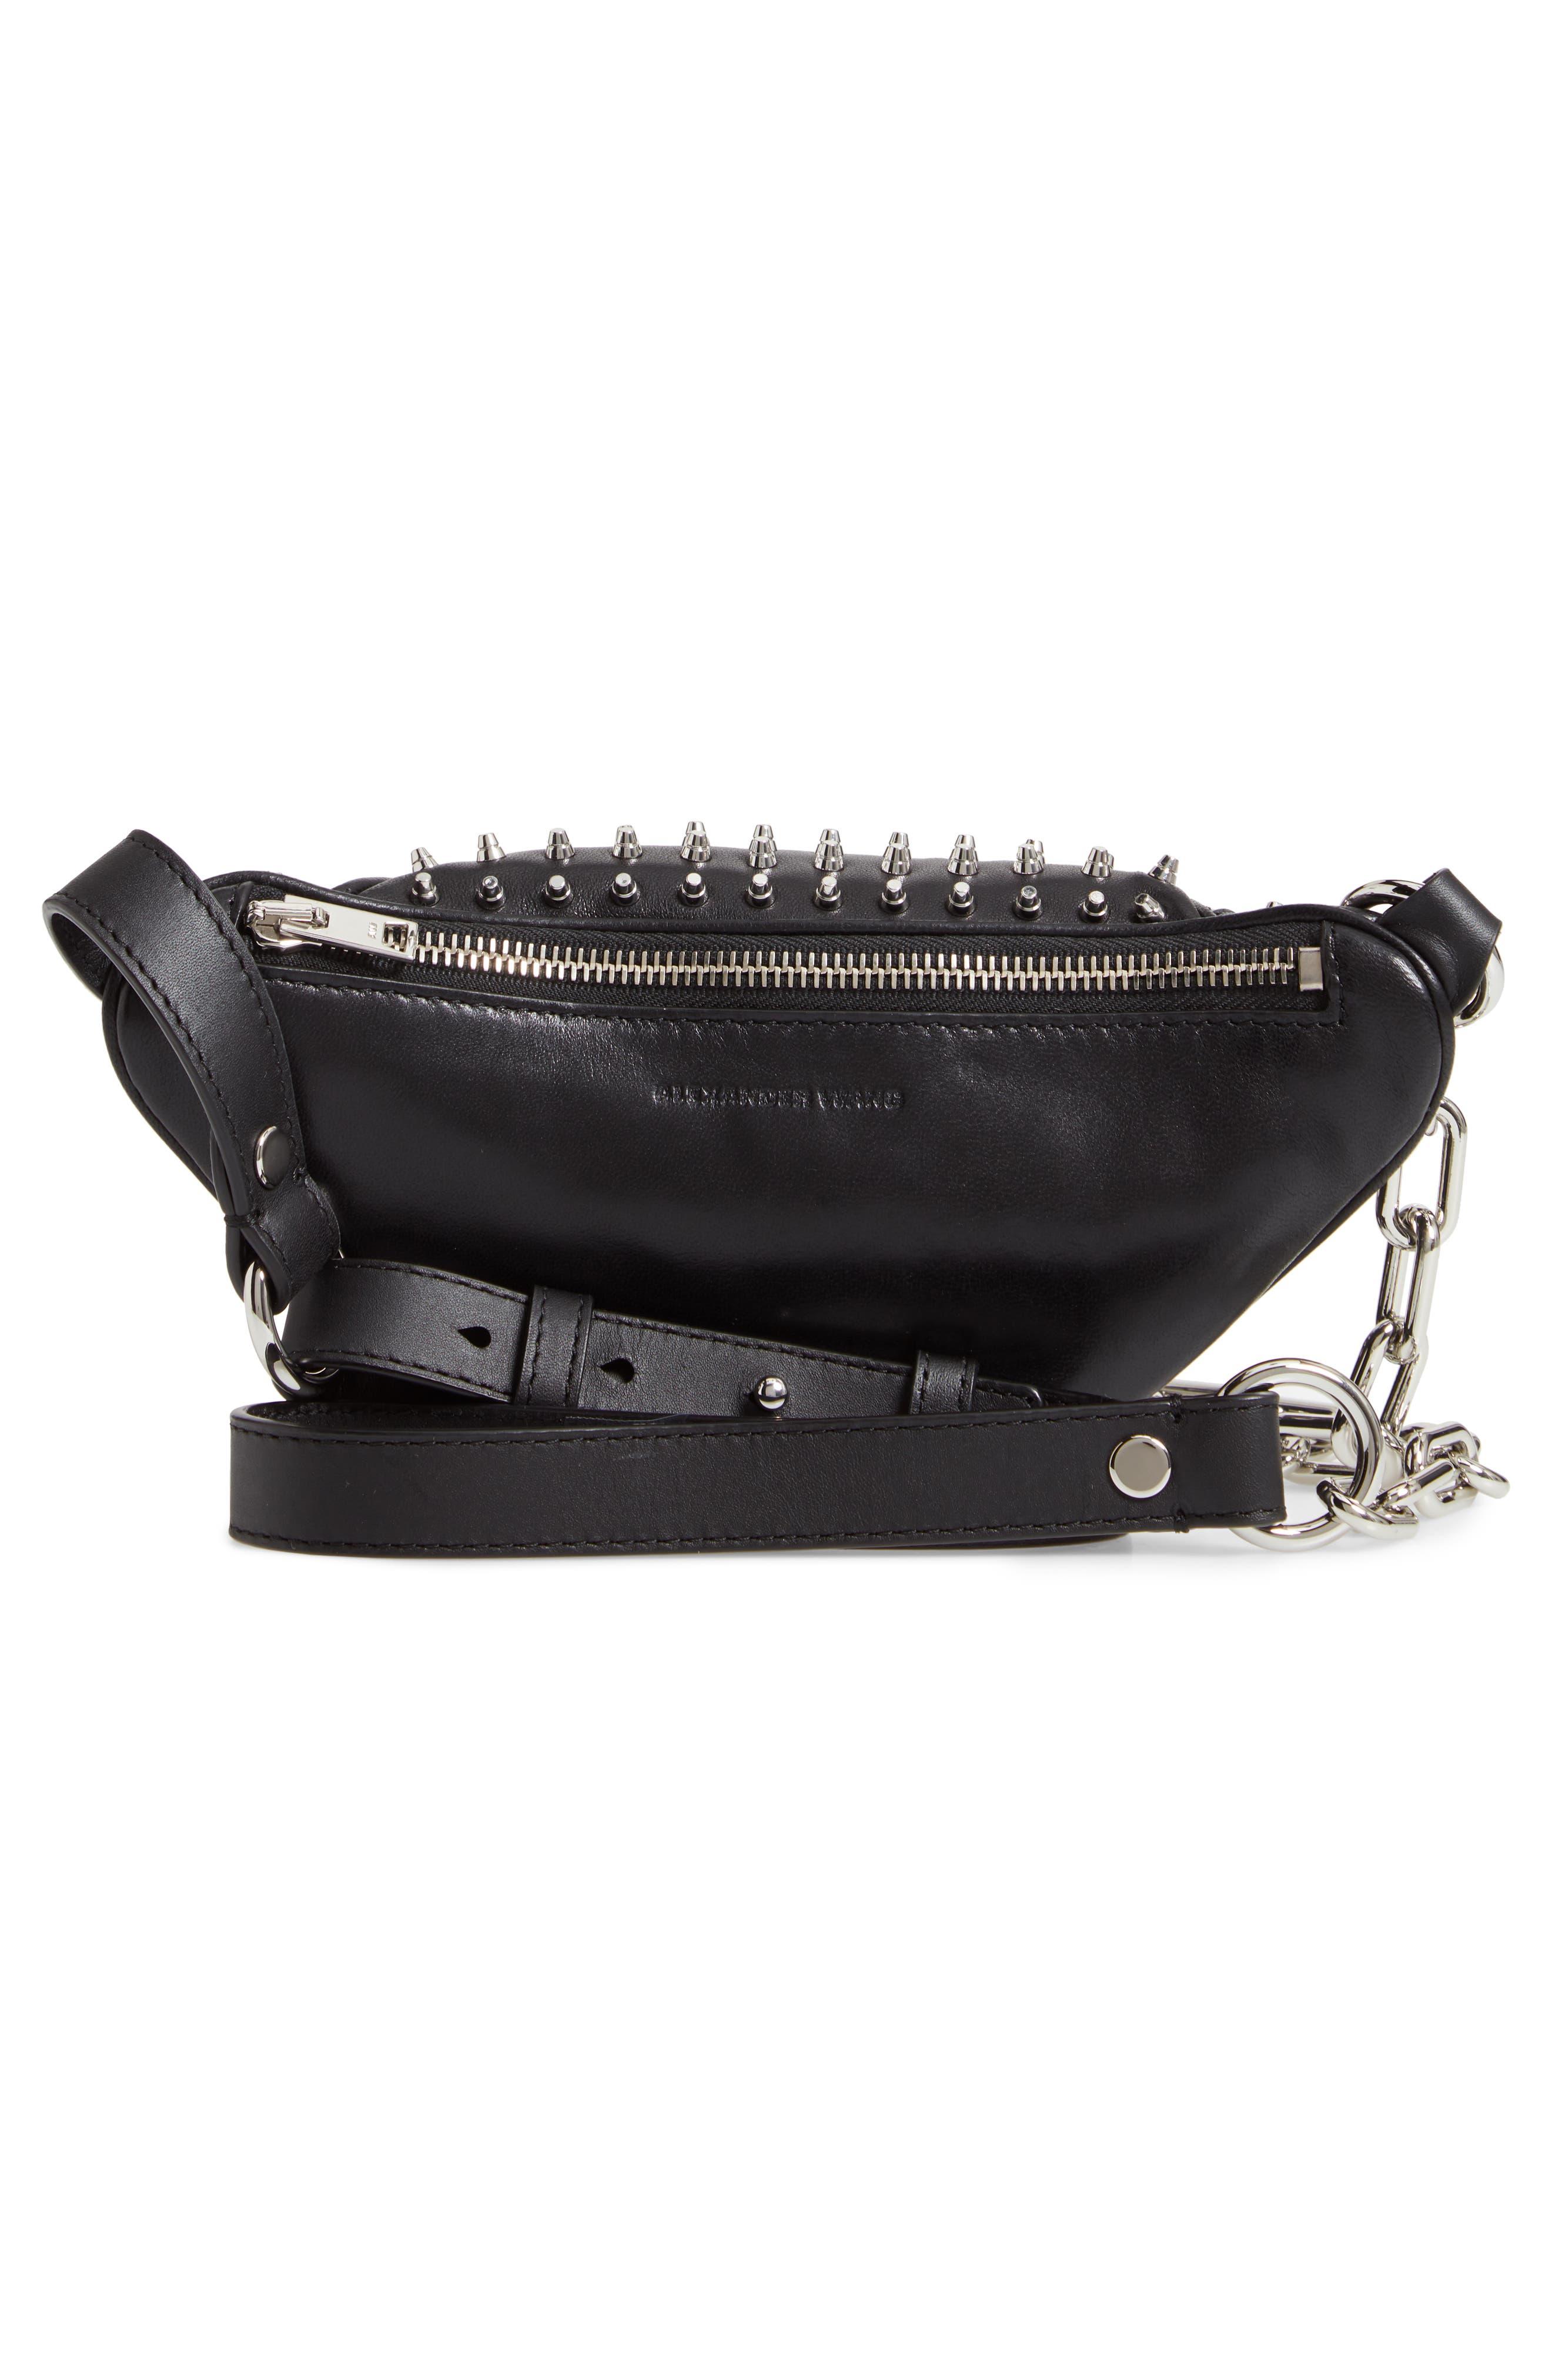 Attica Studded Lambskin Leather Fanny Pack,                             Alternate thumbnail 3, color,                             BLACK